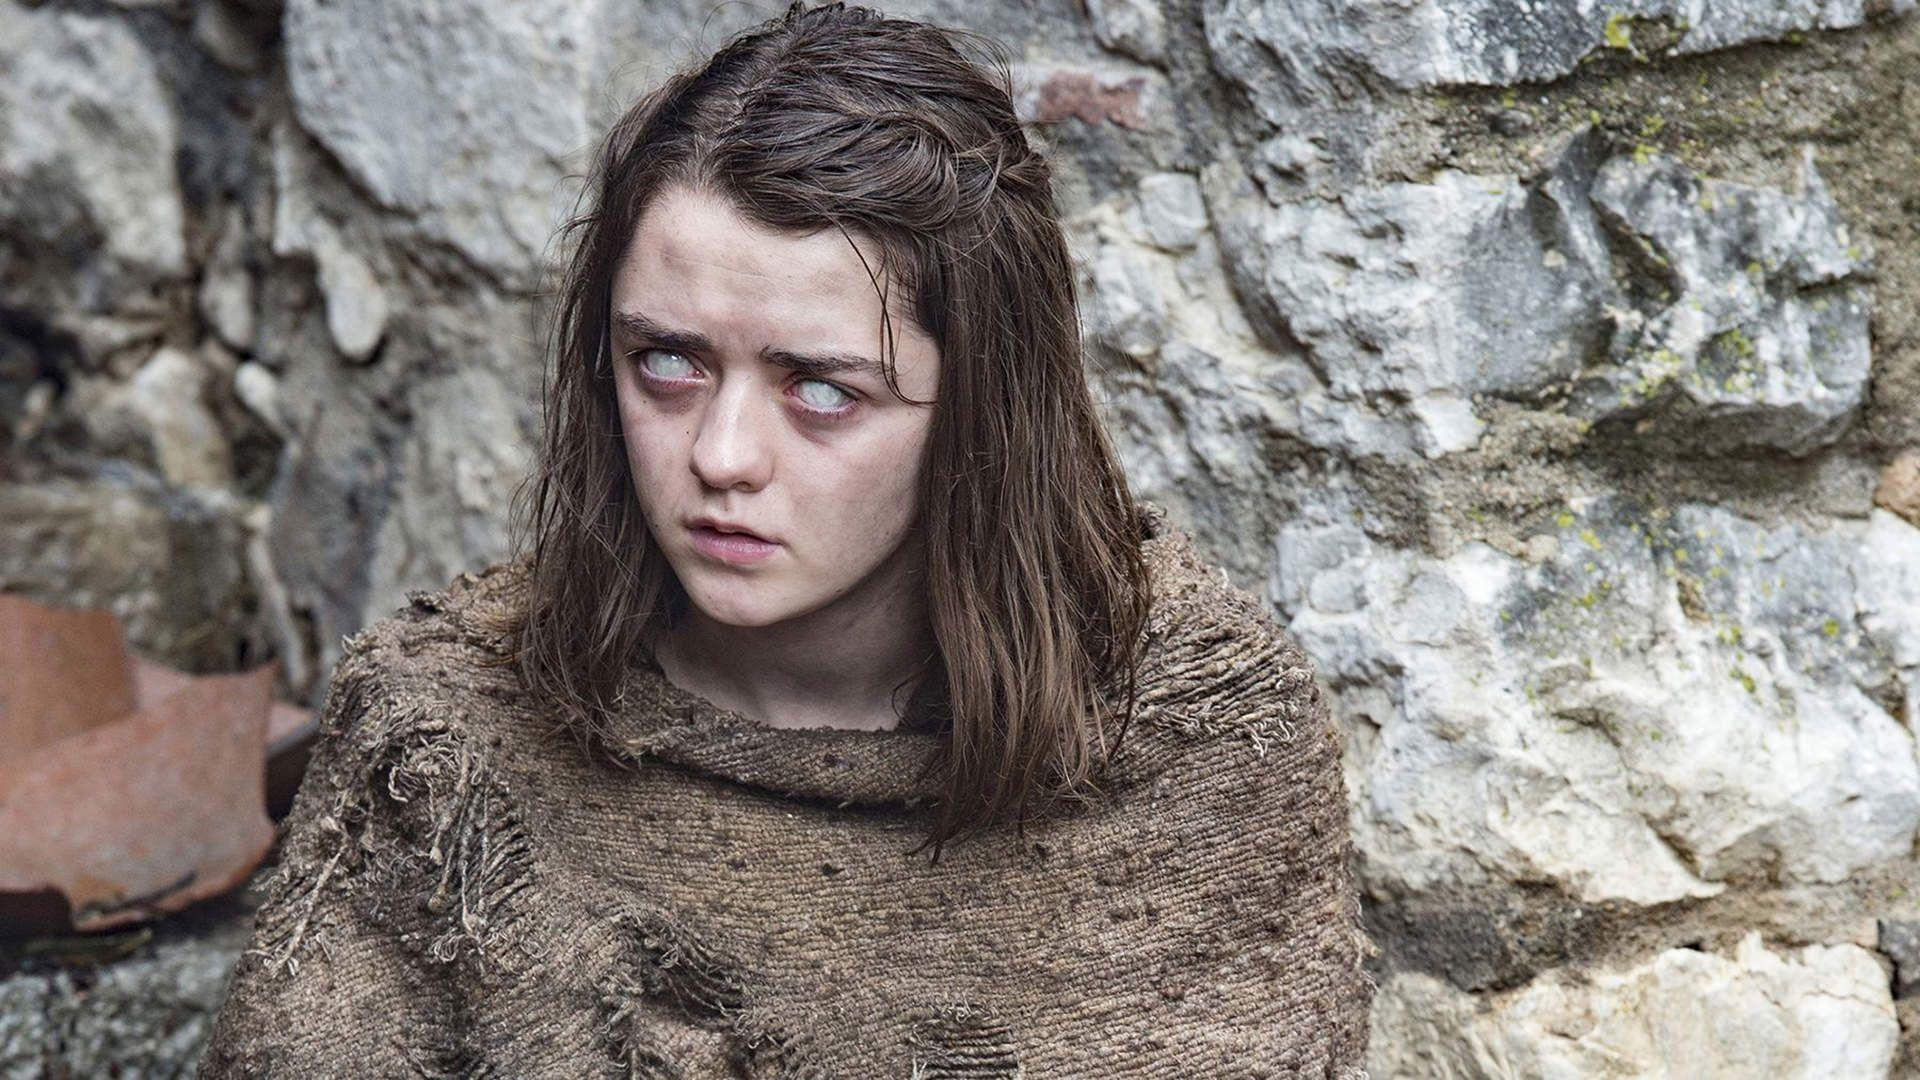 50 Curiosita Su Game Of Thrones Wired Sansa Stark Season 6 Arya Stark Wallpaper Latest Game Of Thrones